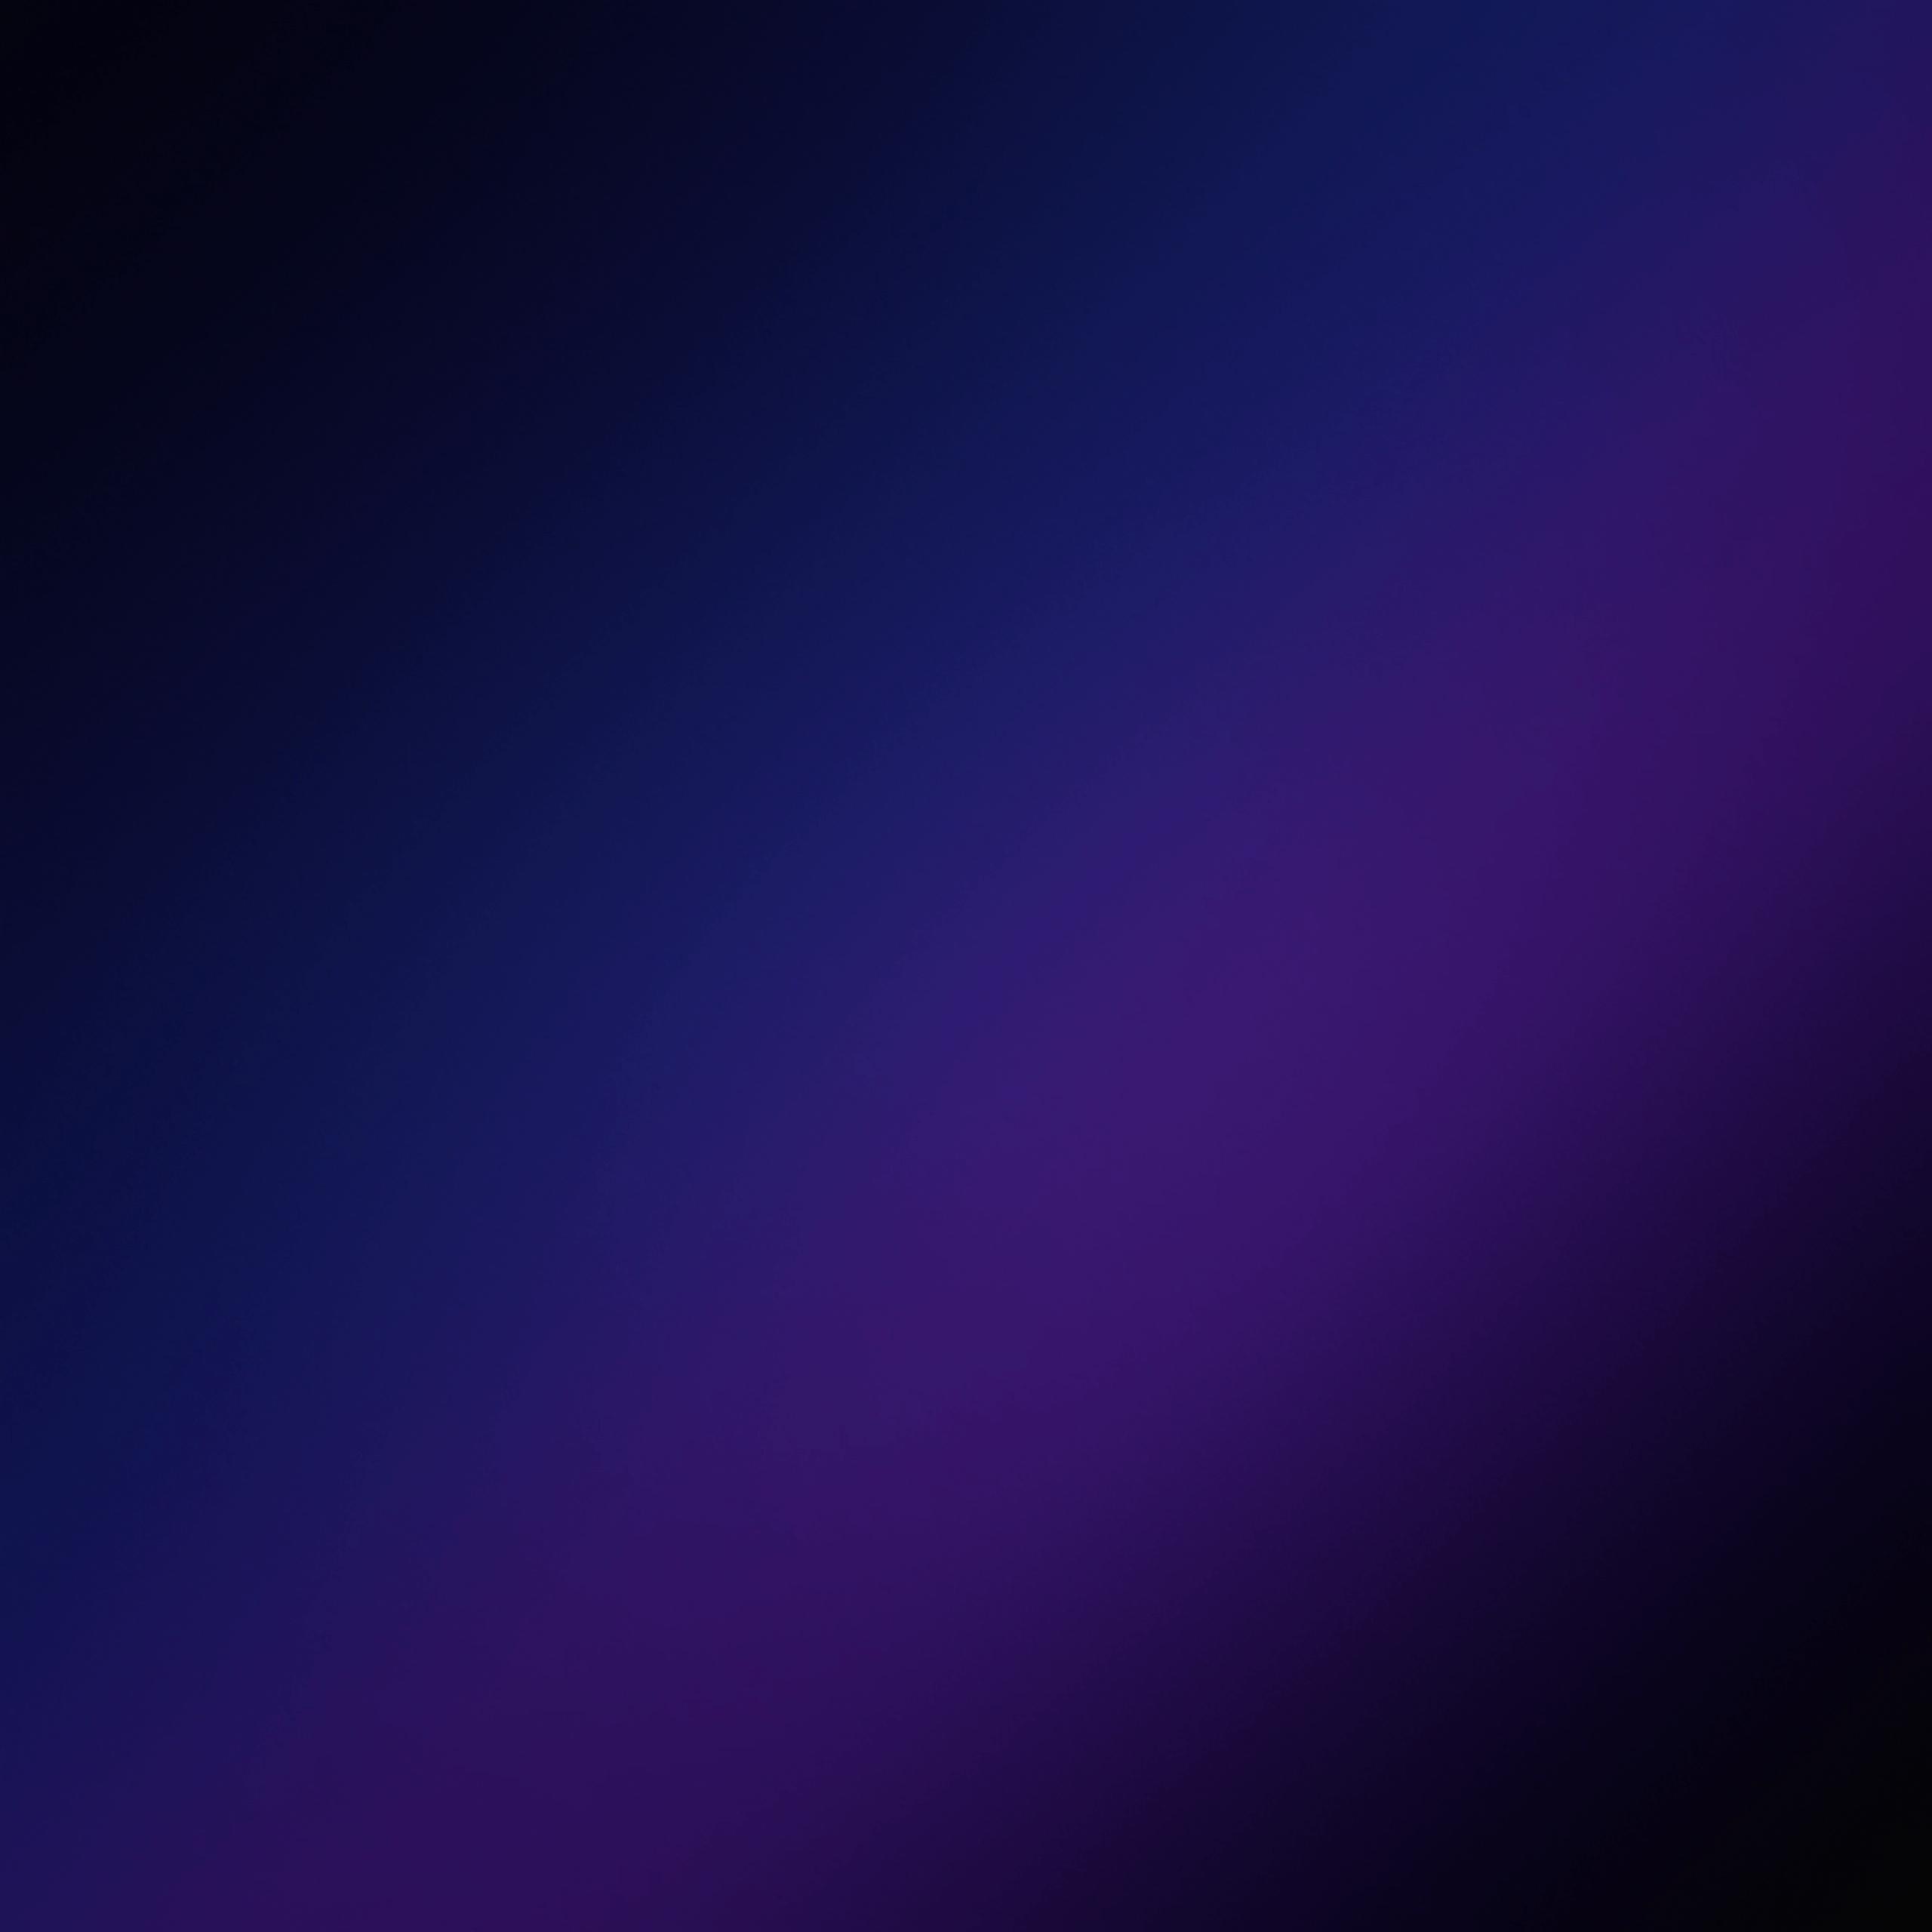 4k Samsung Galaxy Wallpapers Top Free 4k Samsung Galaxy